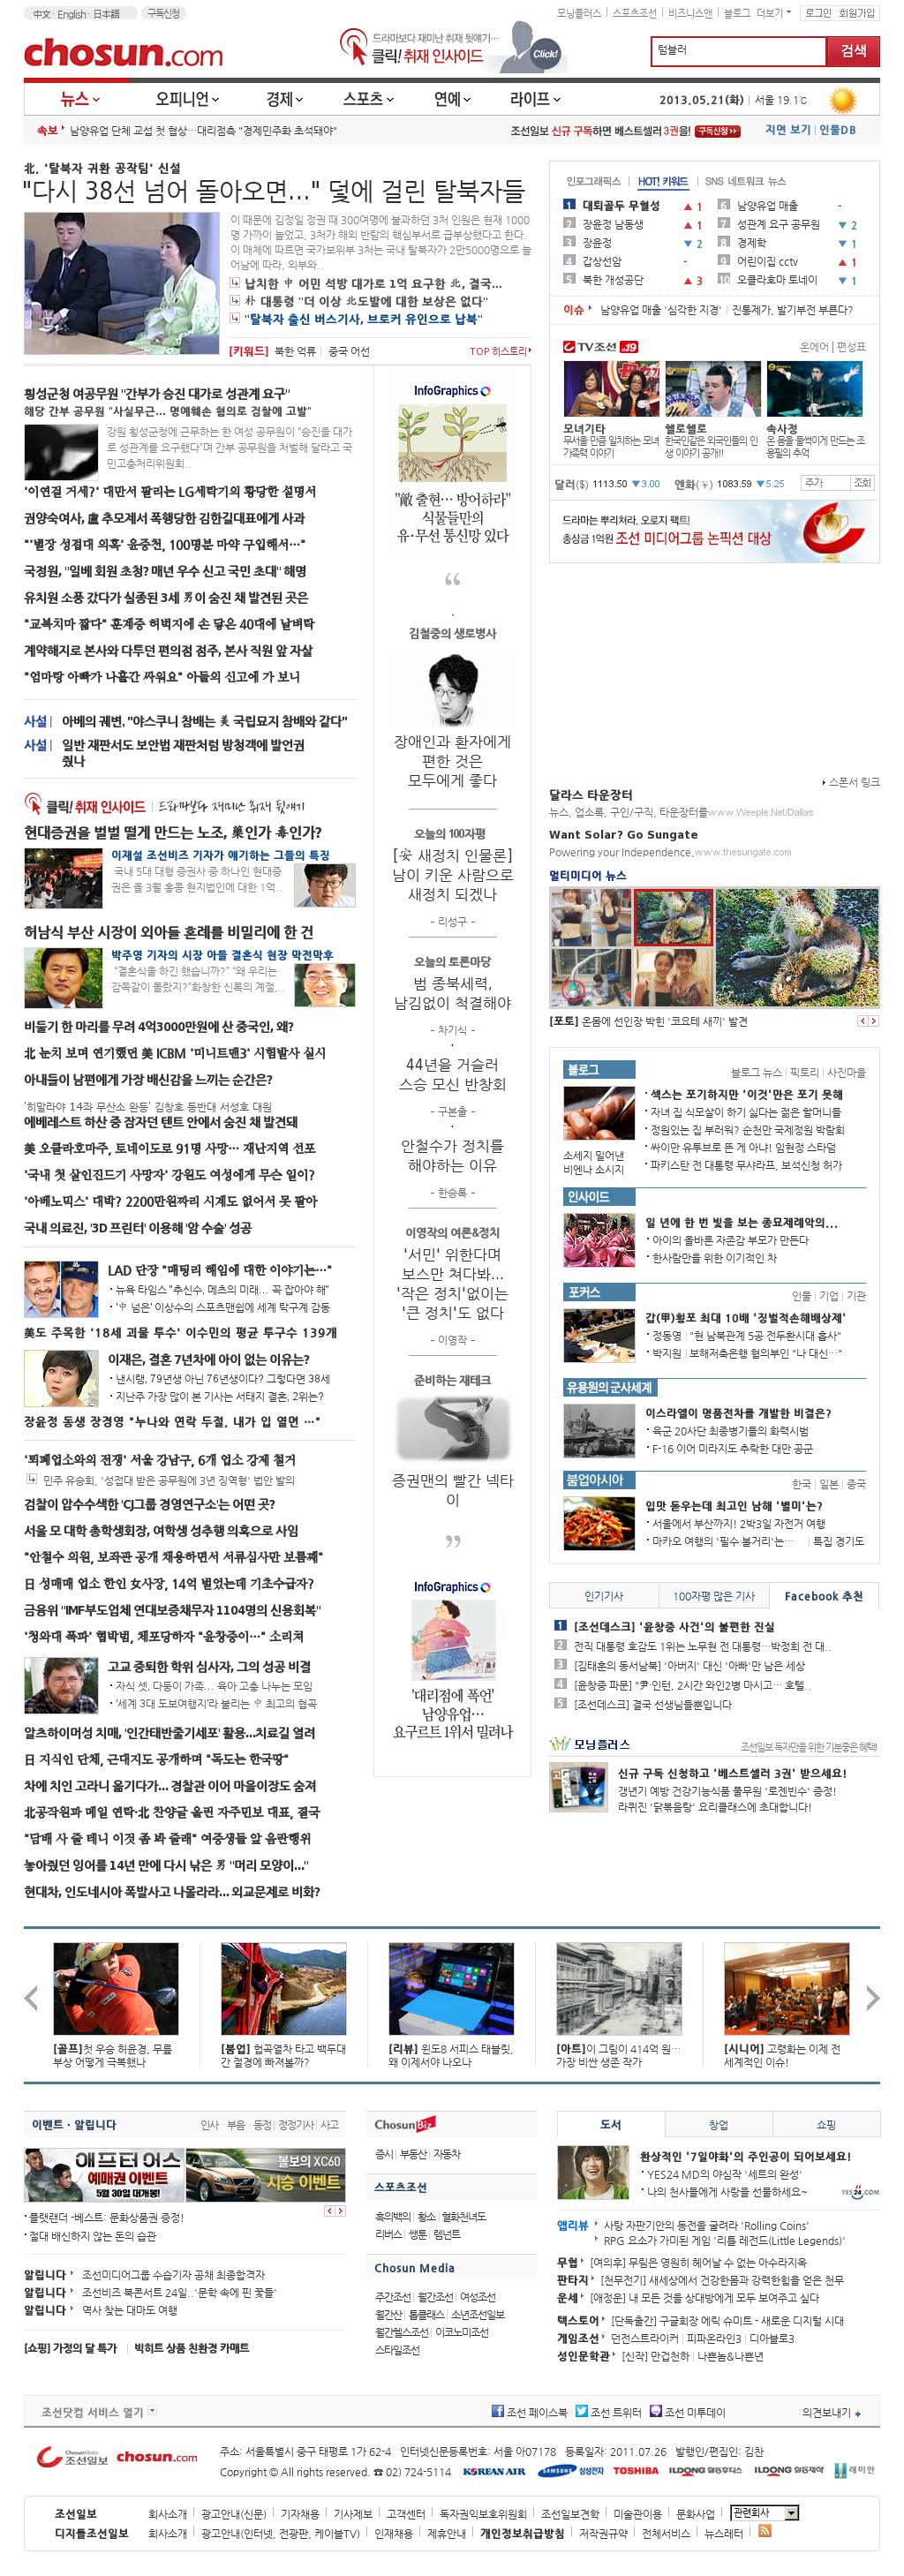 chosun.com at Tuesday May 21, 2013, 1:03 p.m. UTC